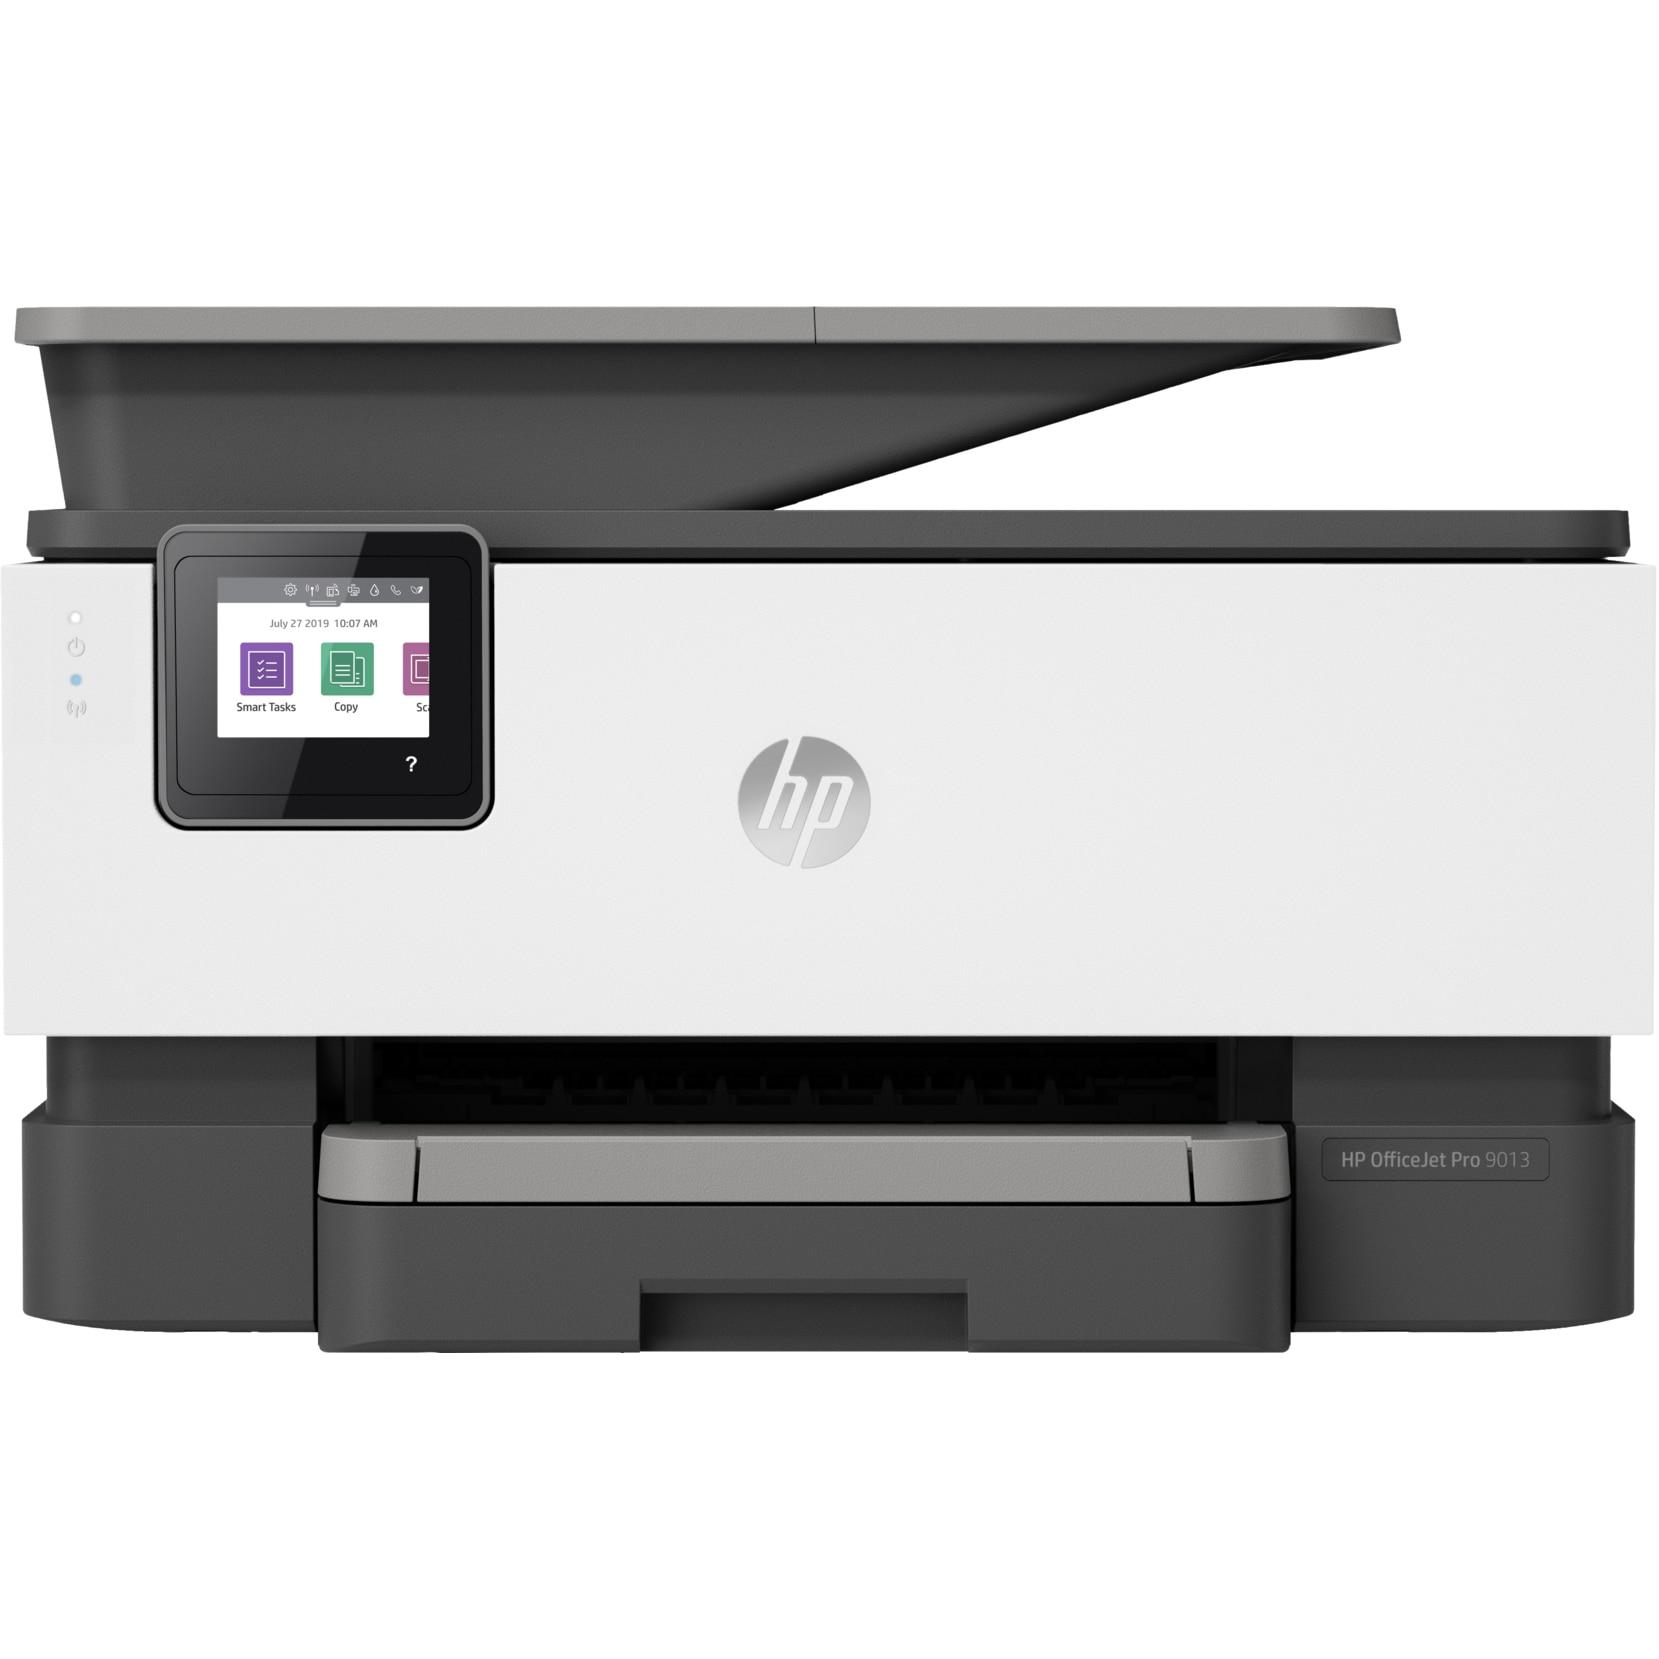 Fotografie Imprimanta inkjet color HP OfficeJet Pro 9013, Retea, Wireless, Duplex, ADF, A4